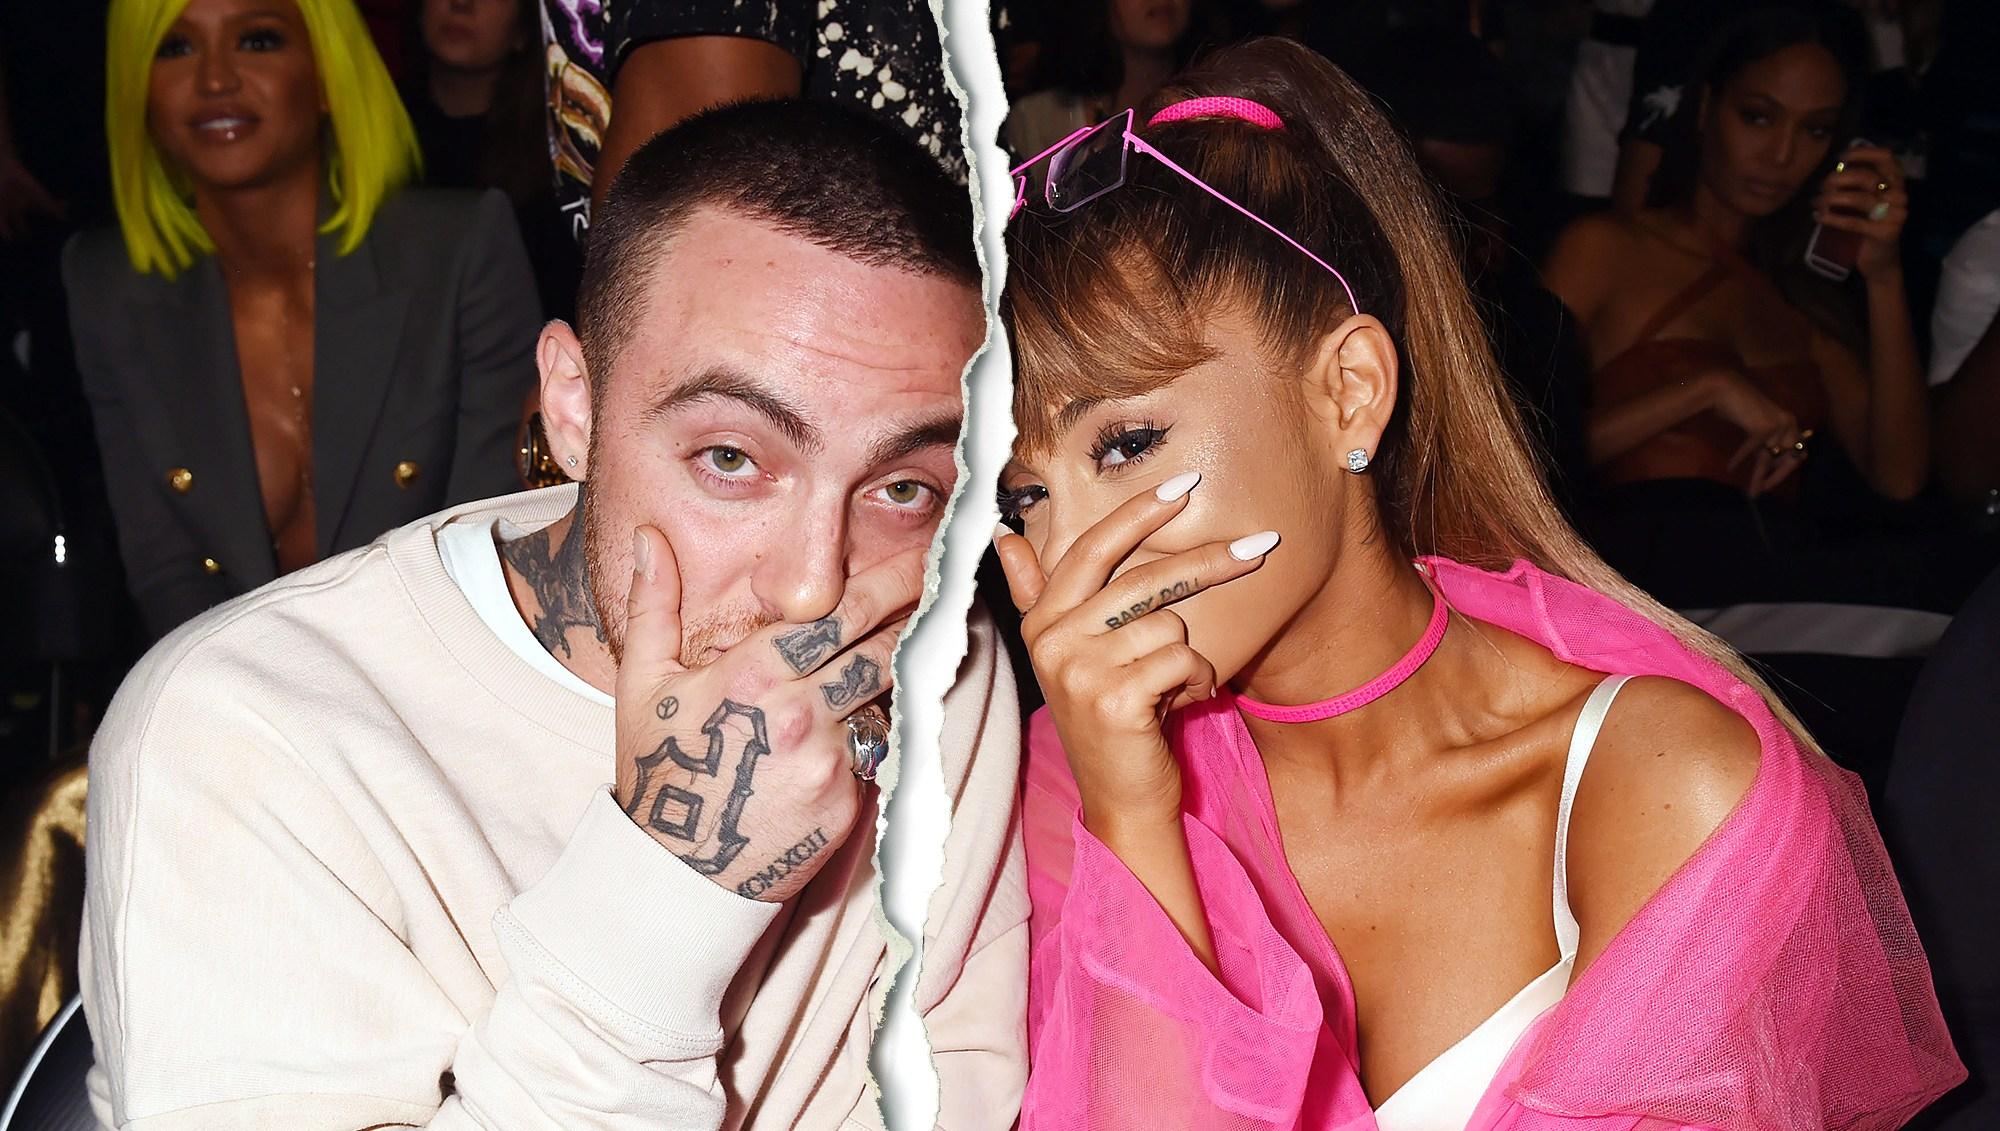 Mac Miller Ariana Grande split